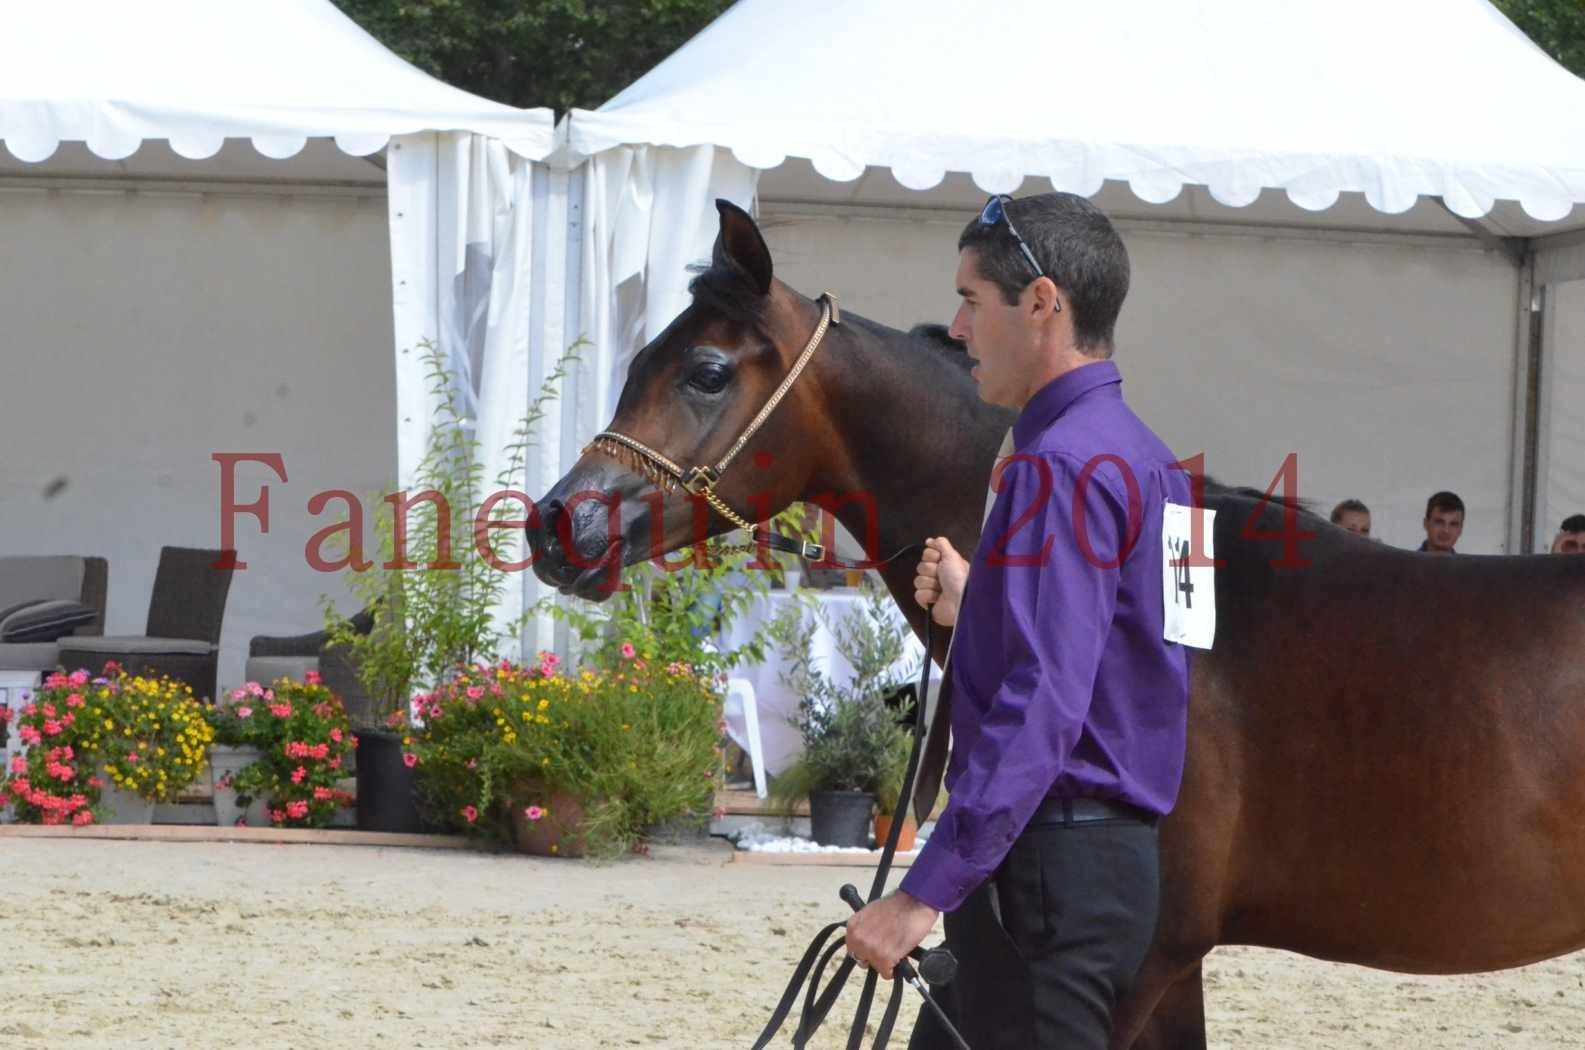 Championnat de FRANCE 2014 - Amateurs - SH FARAJAA - 31